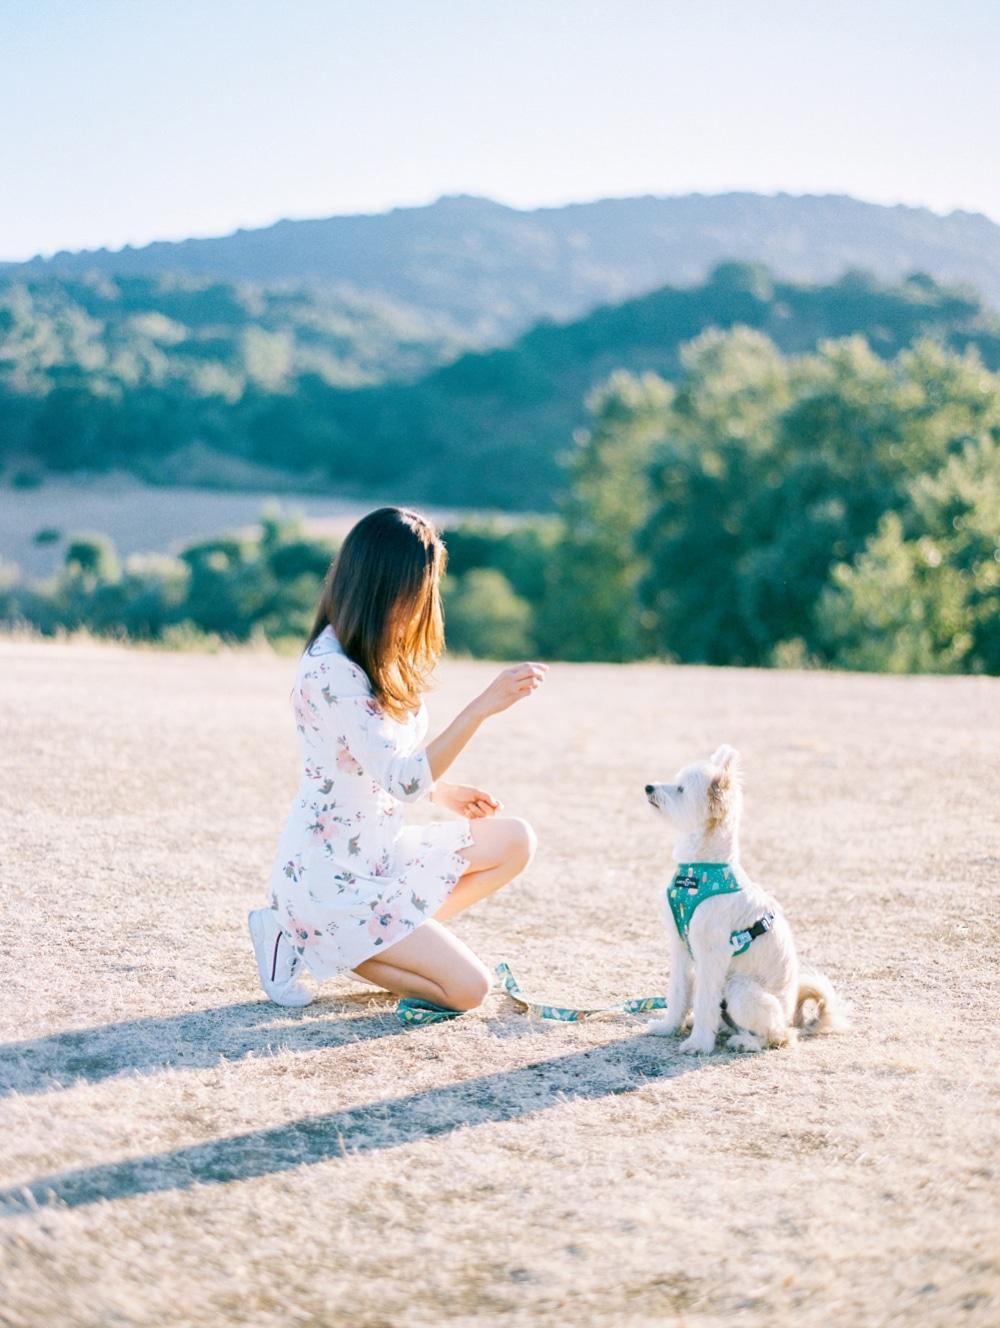 Kristin-La-Voie-Photography-california-wedding-photographer-dog-session-rancho-san-antonio-los-altos-46